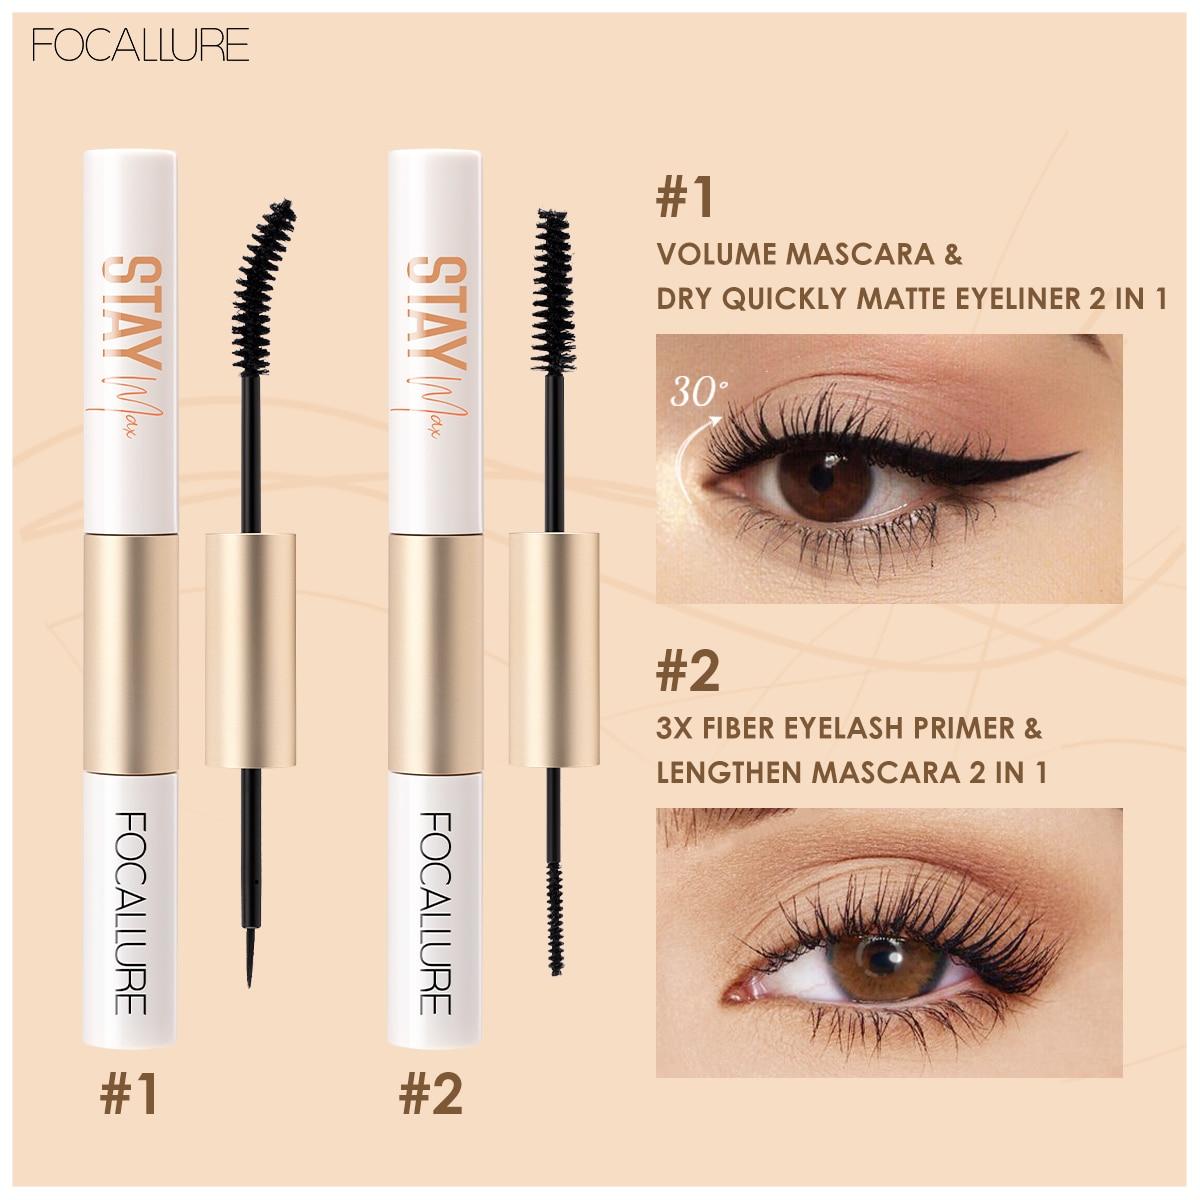 Focallure Mascara 2 In 1 Mascara Fiber Eyelash Primer 3X Lengthen Eyelashes And Waterproof Mascara Eyeliner Cosmetic